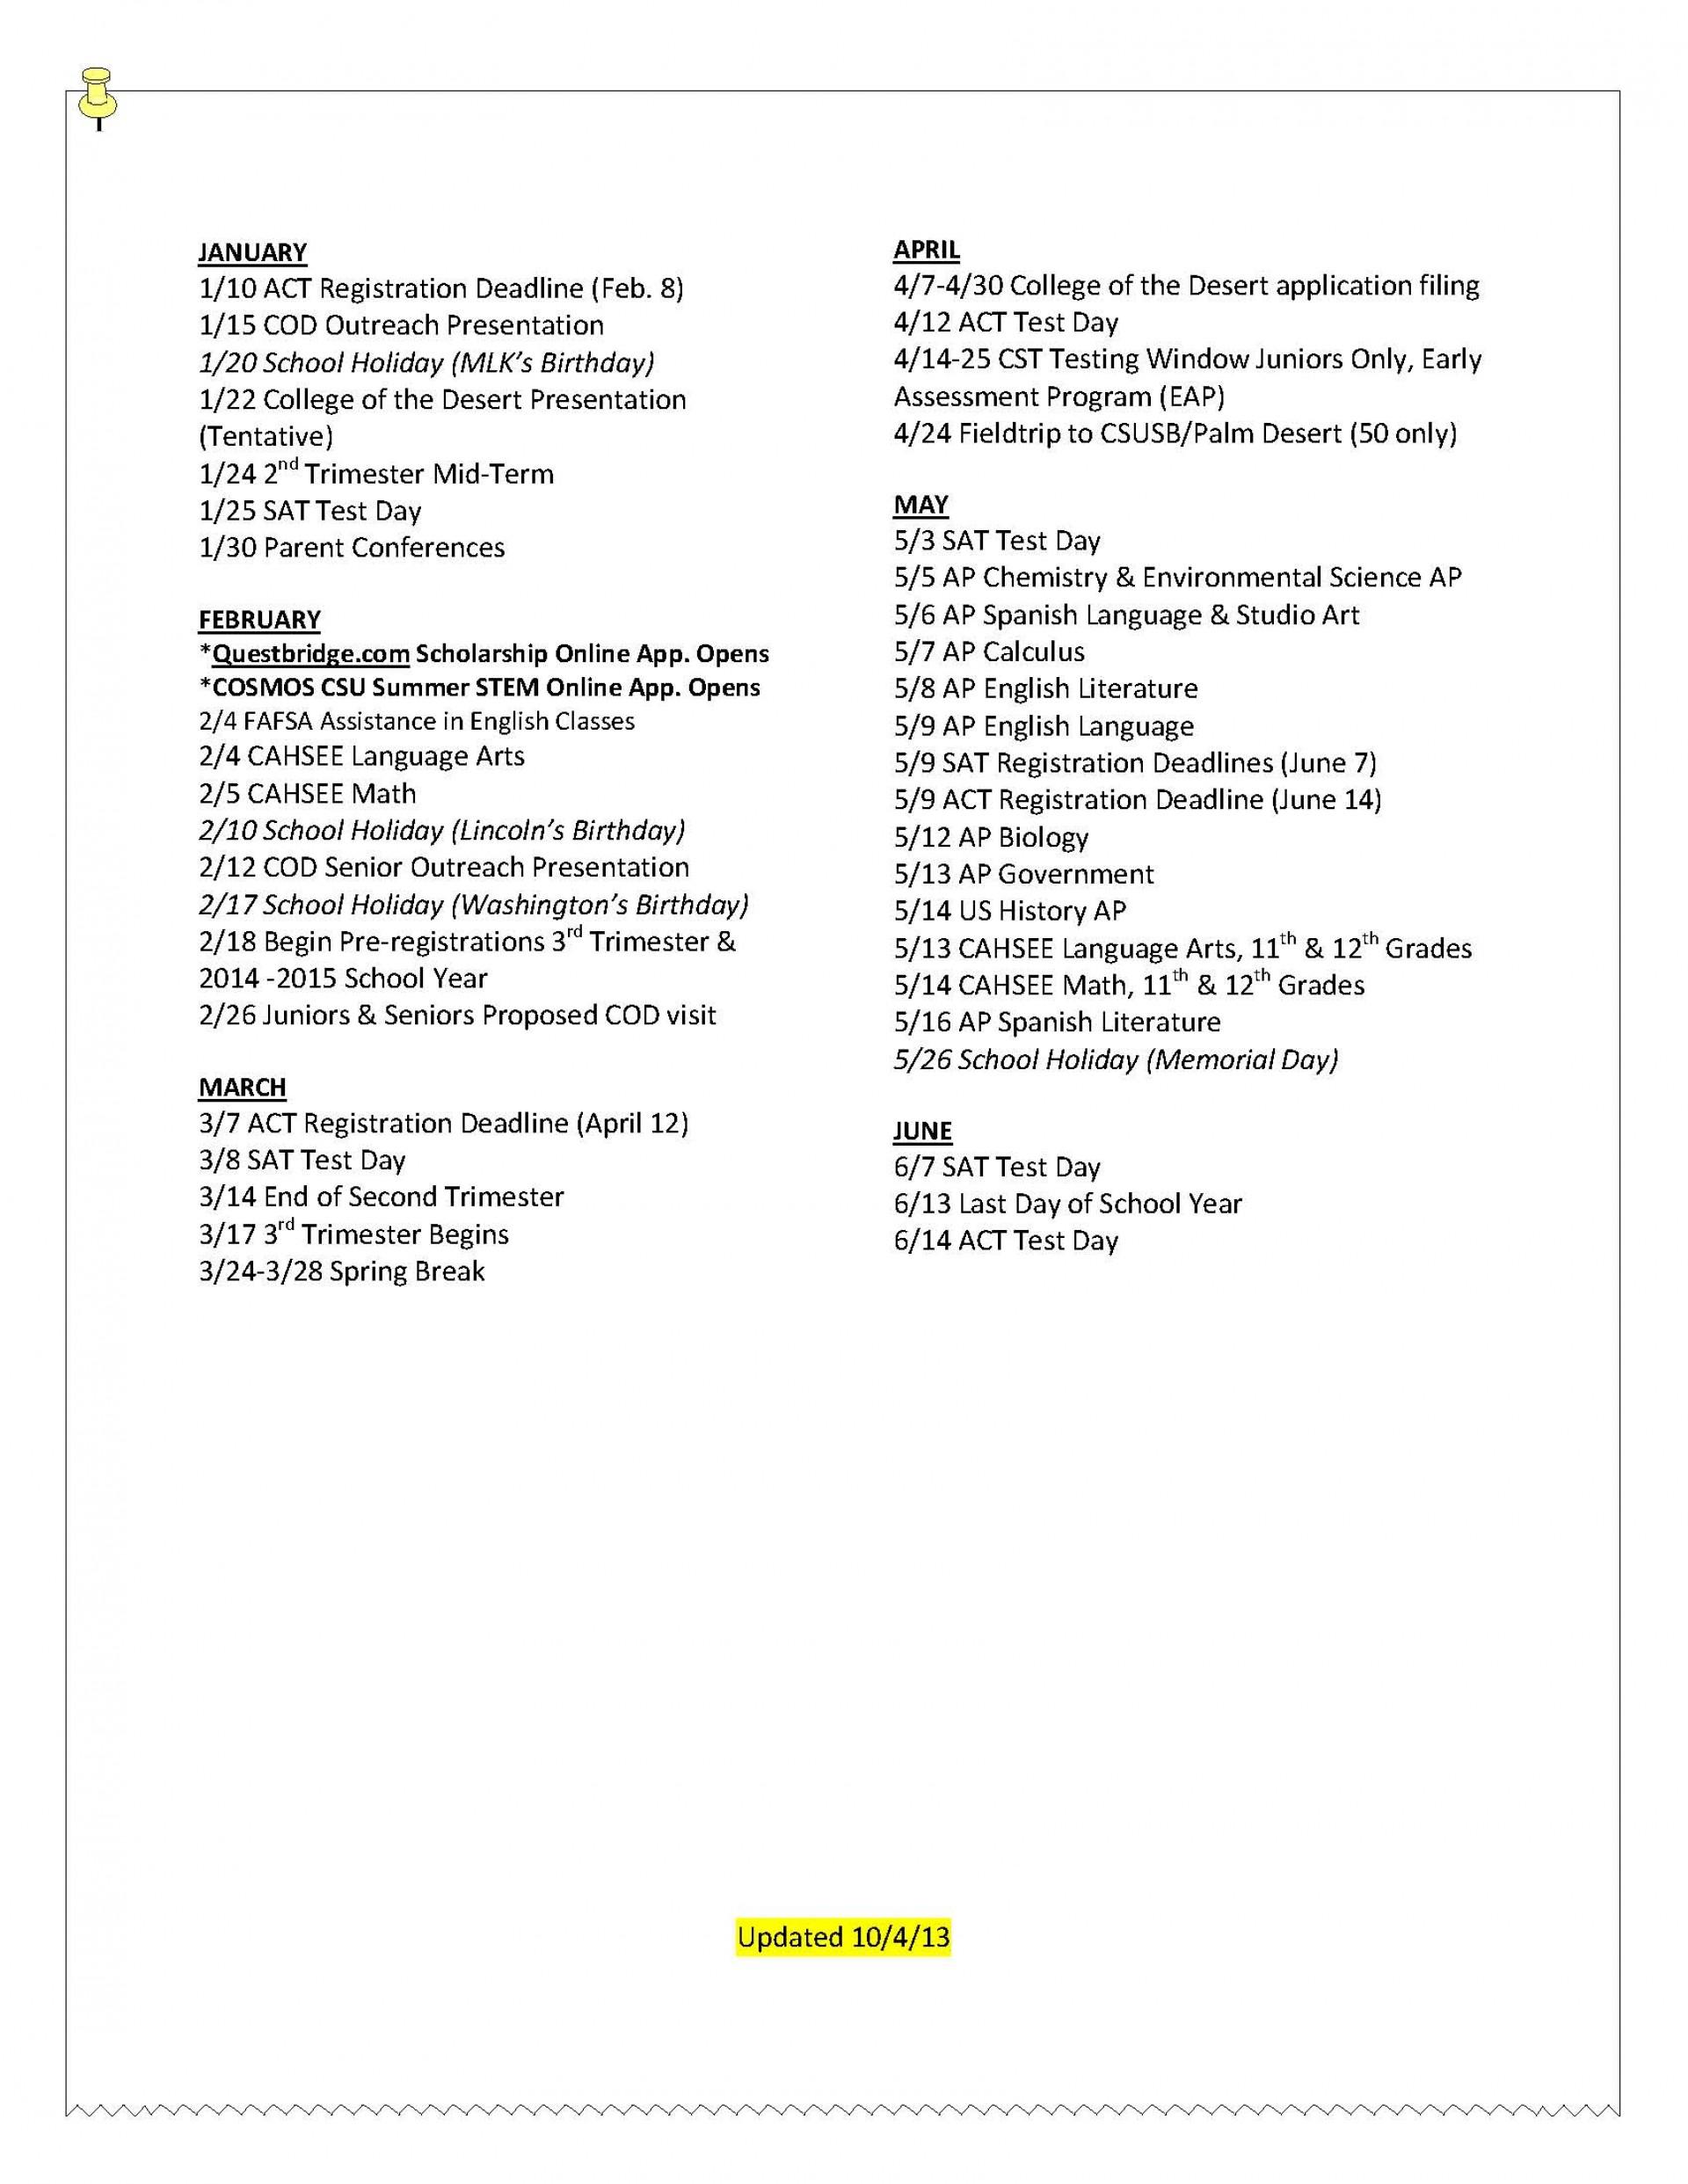 002 Spring Break Essay Junior20calendar2020152012 18 Page 2 Stupendous Plans Alternative Outline 1920